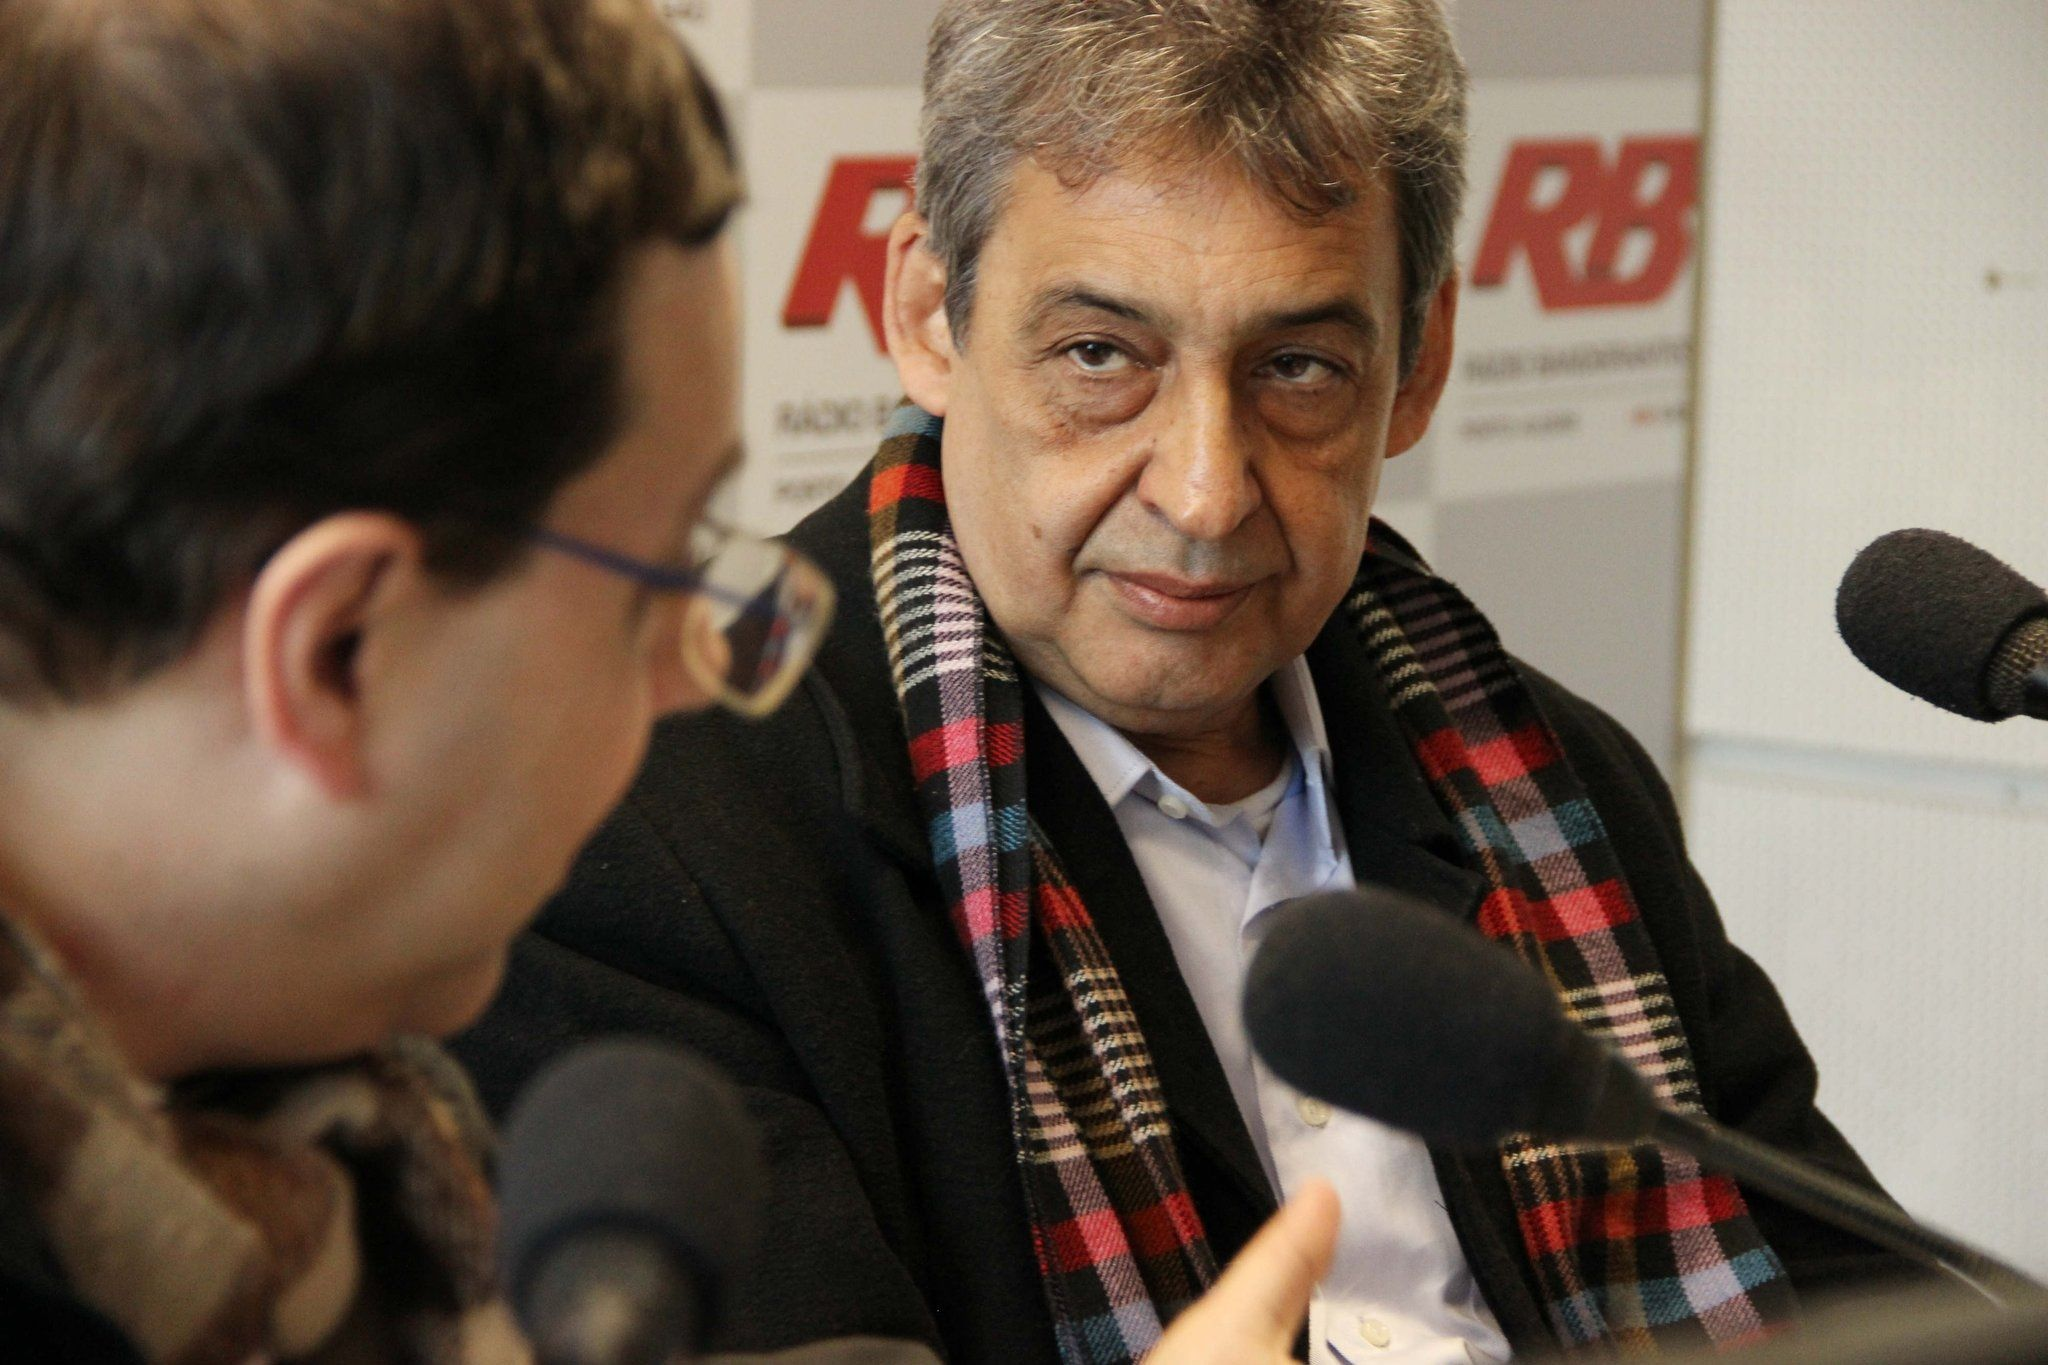 Sebastião Melo anuncia que deixará a política